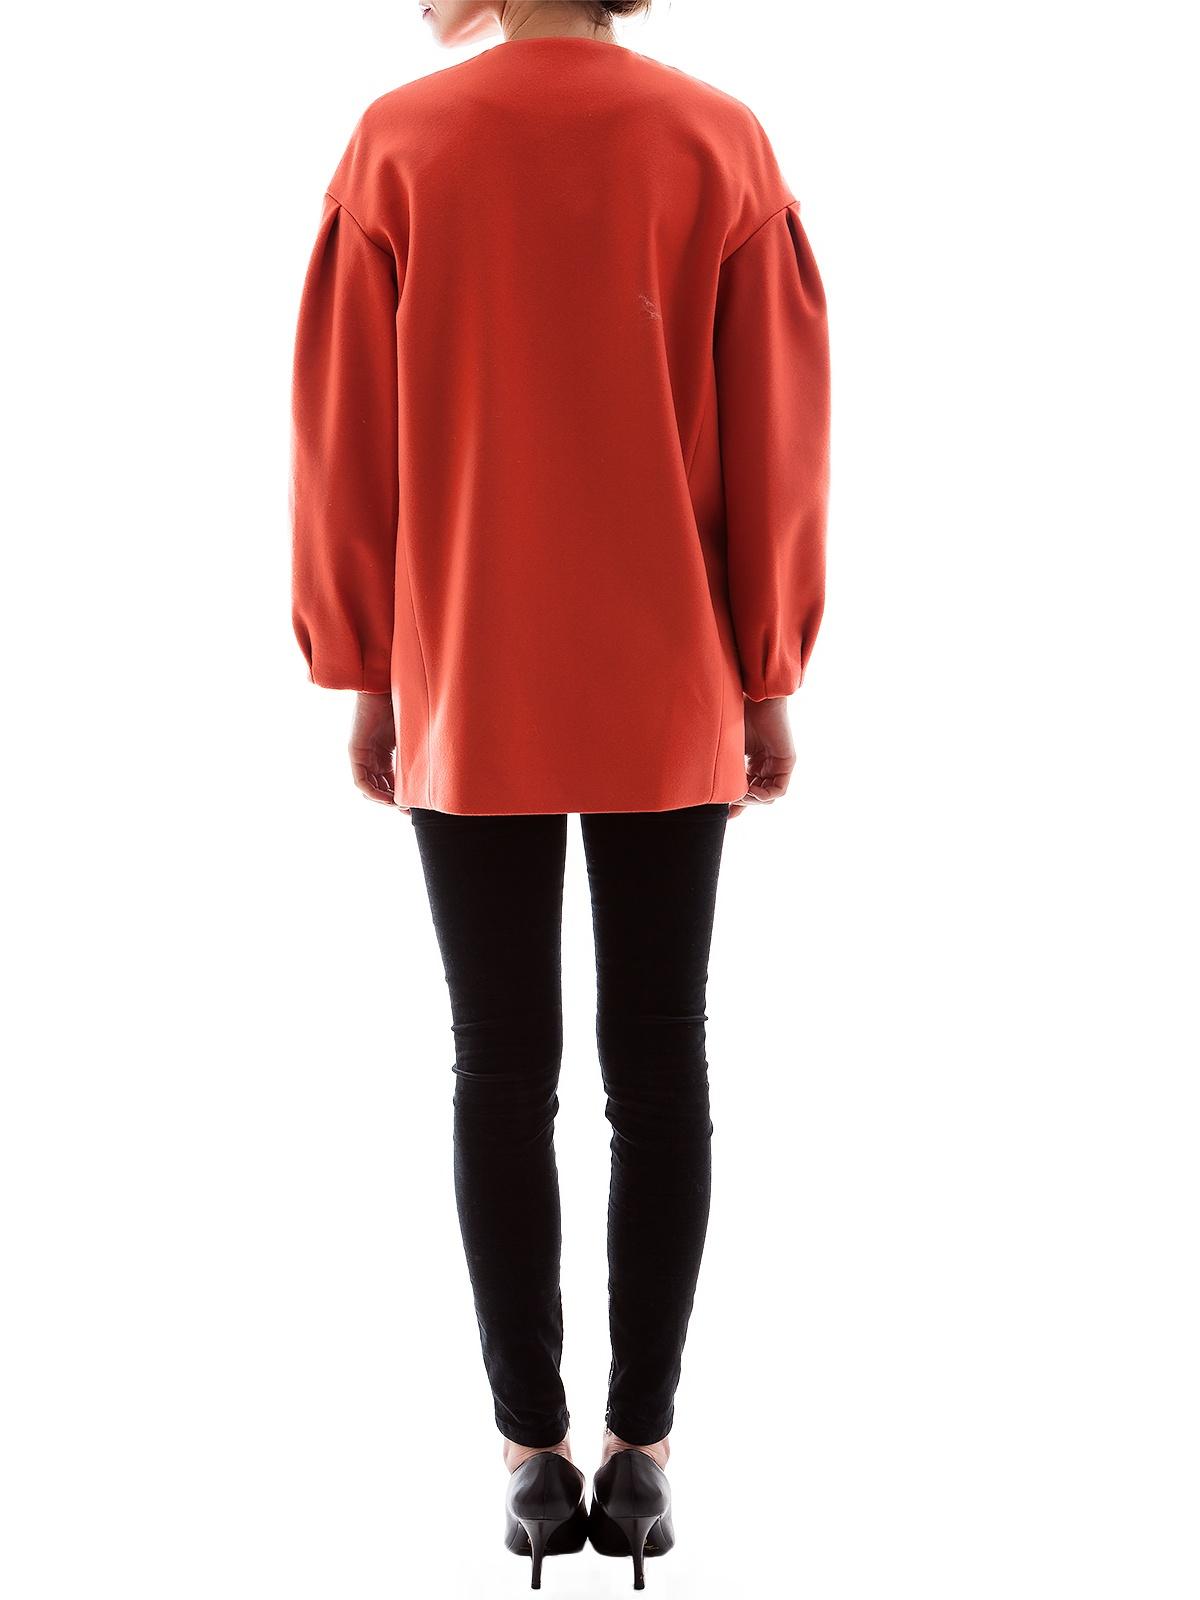 BRYGAN ORANGE COAT | Shop for Fashion Trends in Abrigos & Chaquetas - GIRISSIMA.COM